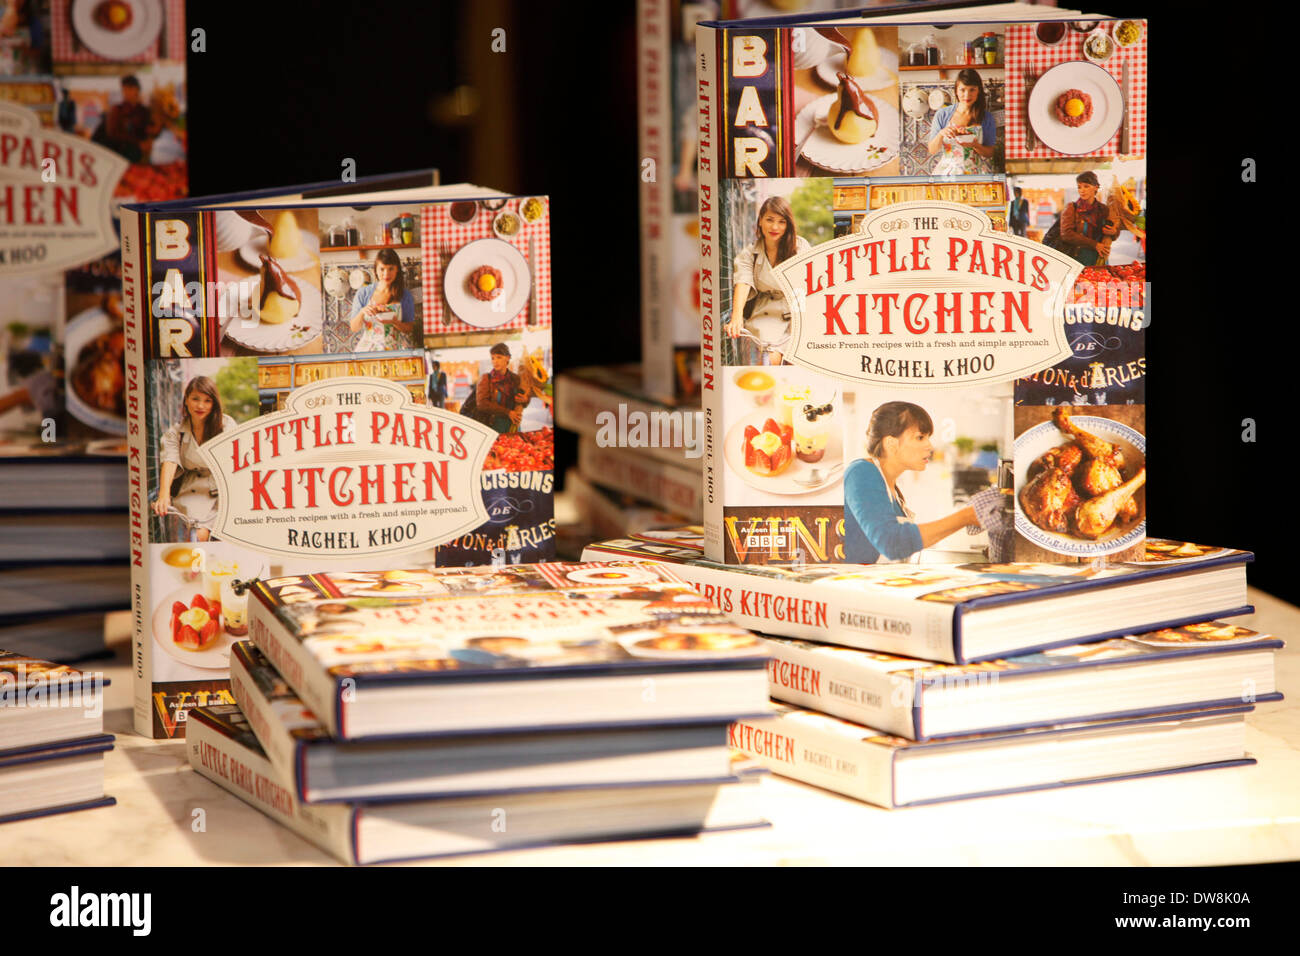 Rachel Khoo From The Hit BBC TV Series The Little Paris Kitchen